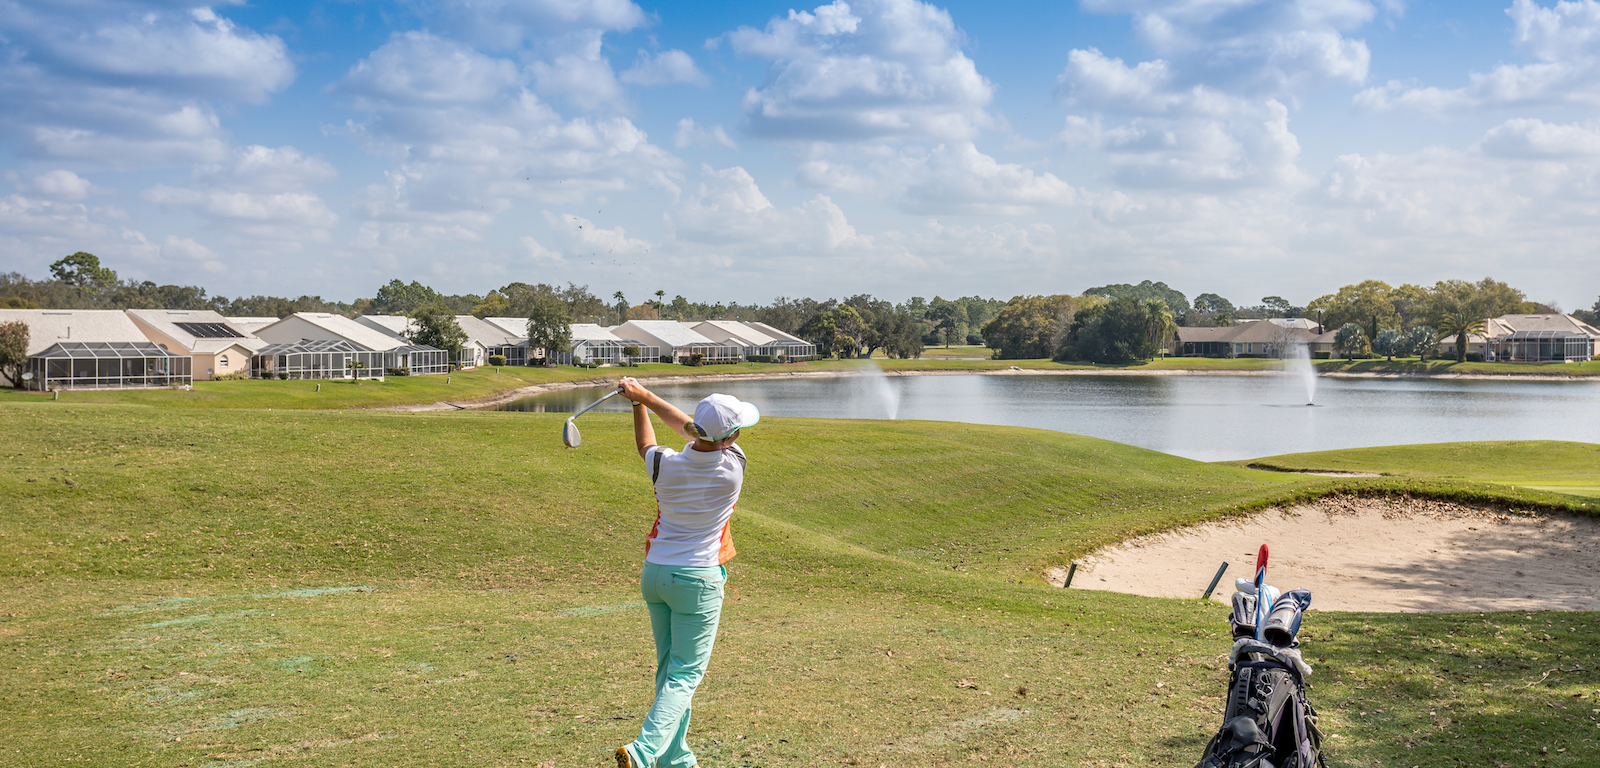 Golfing - golf course